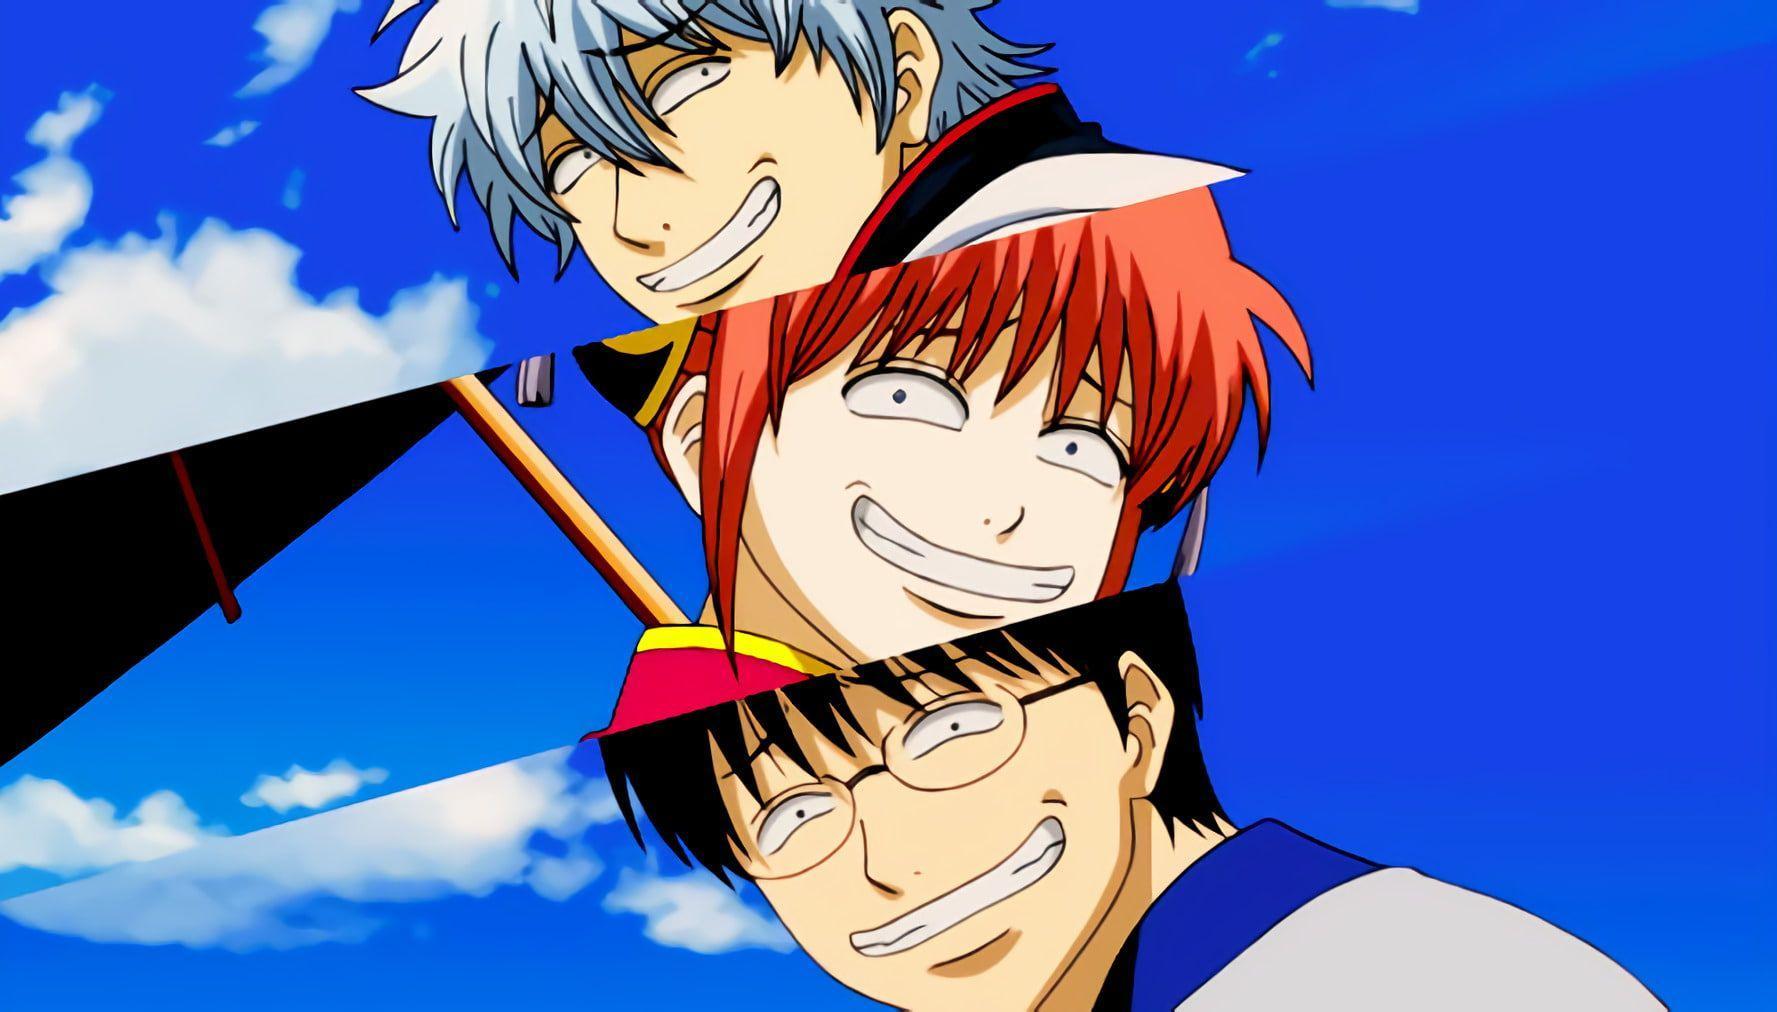 comedy anime about samurai, Gintama